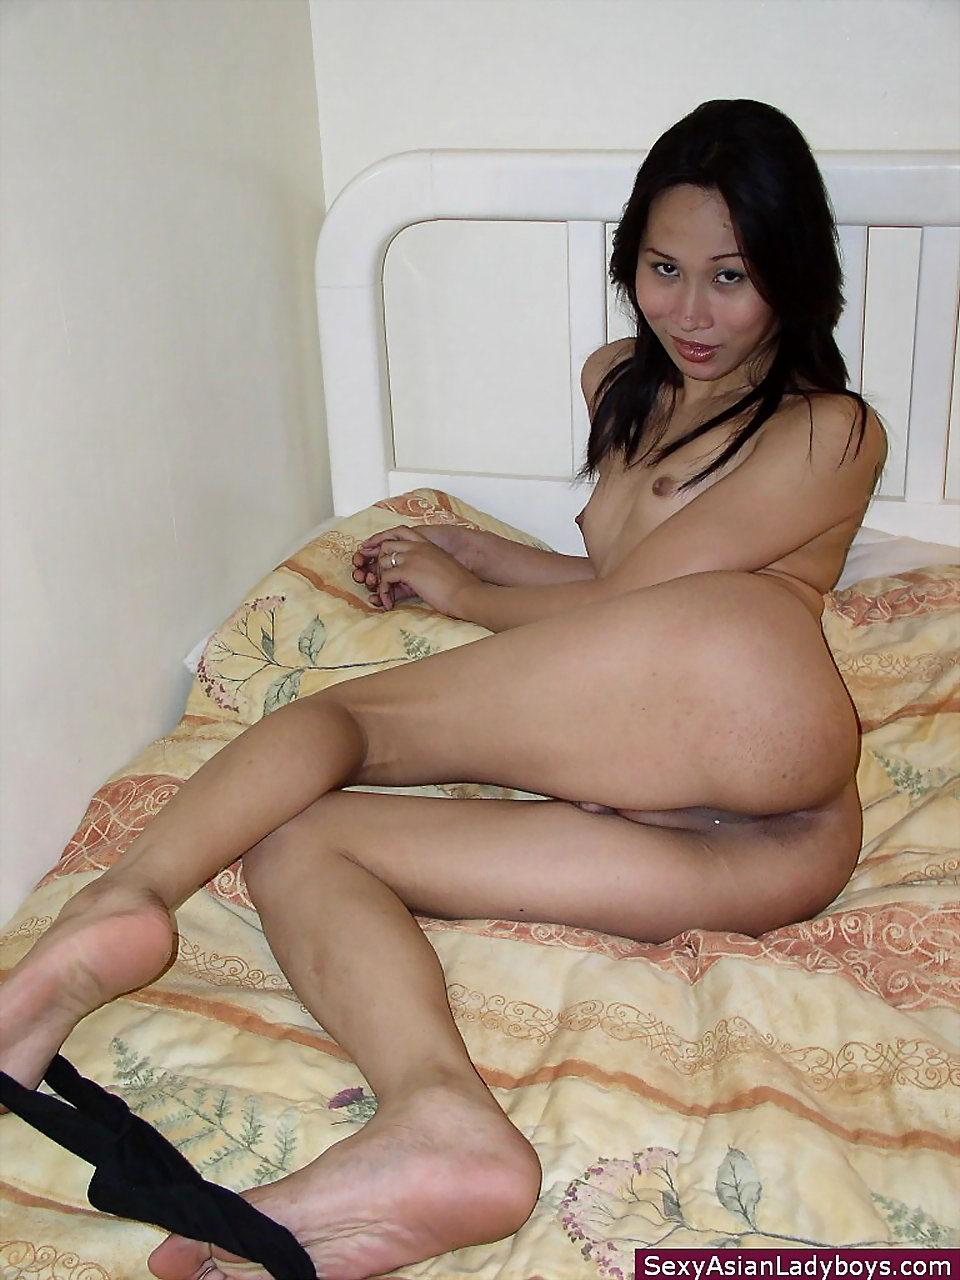 Shy Thai Tranny Offering Her Tight Brown Orifice